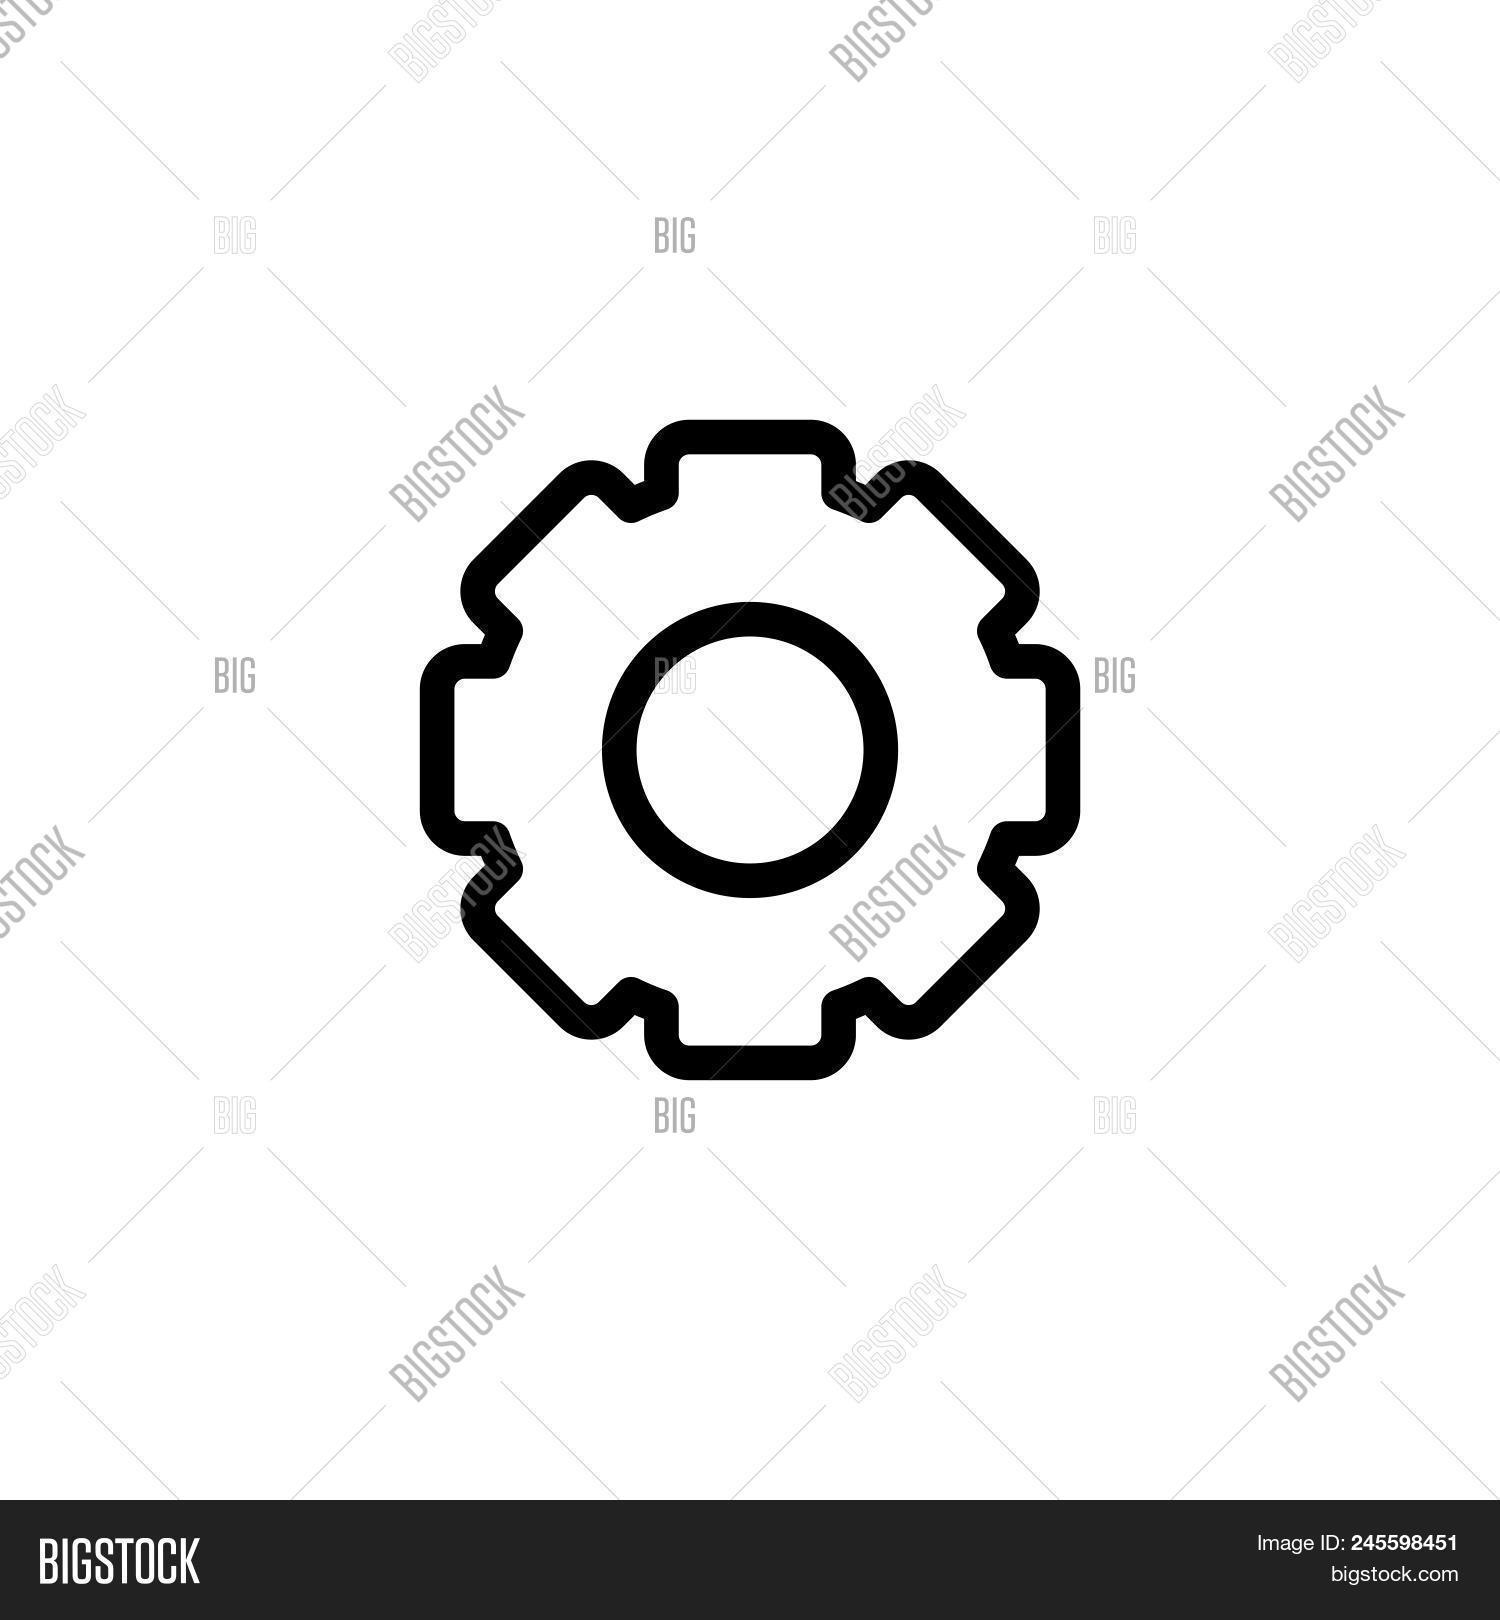 Cog Vector Icon On Vector & Photo (Free Trial)   Bigstock